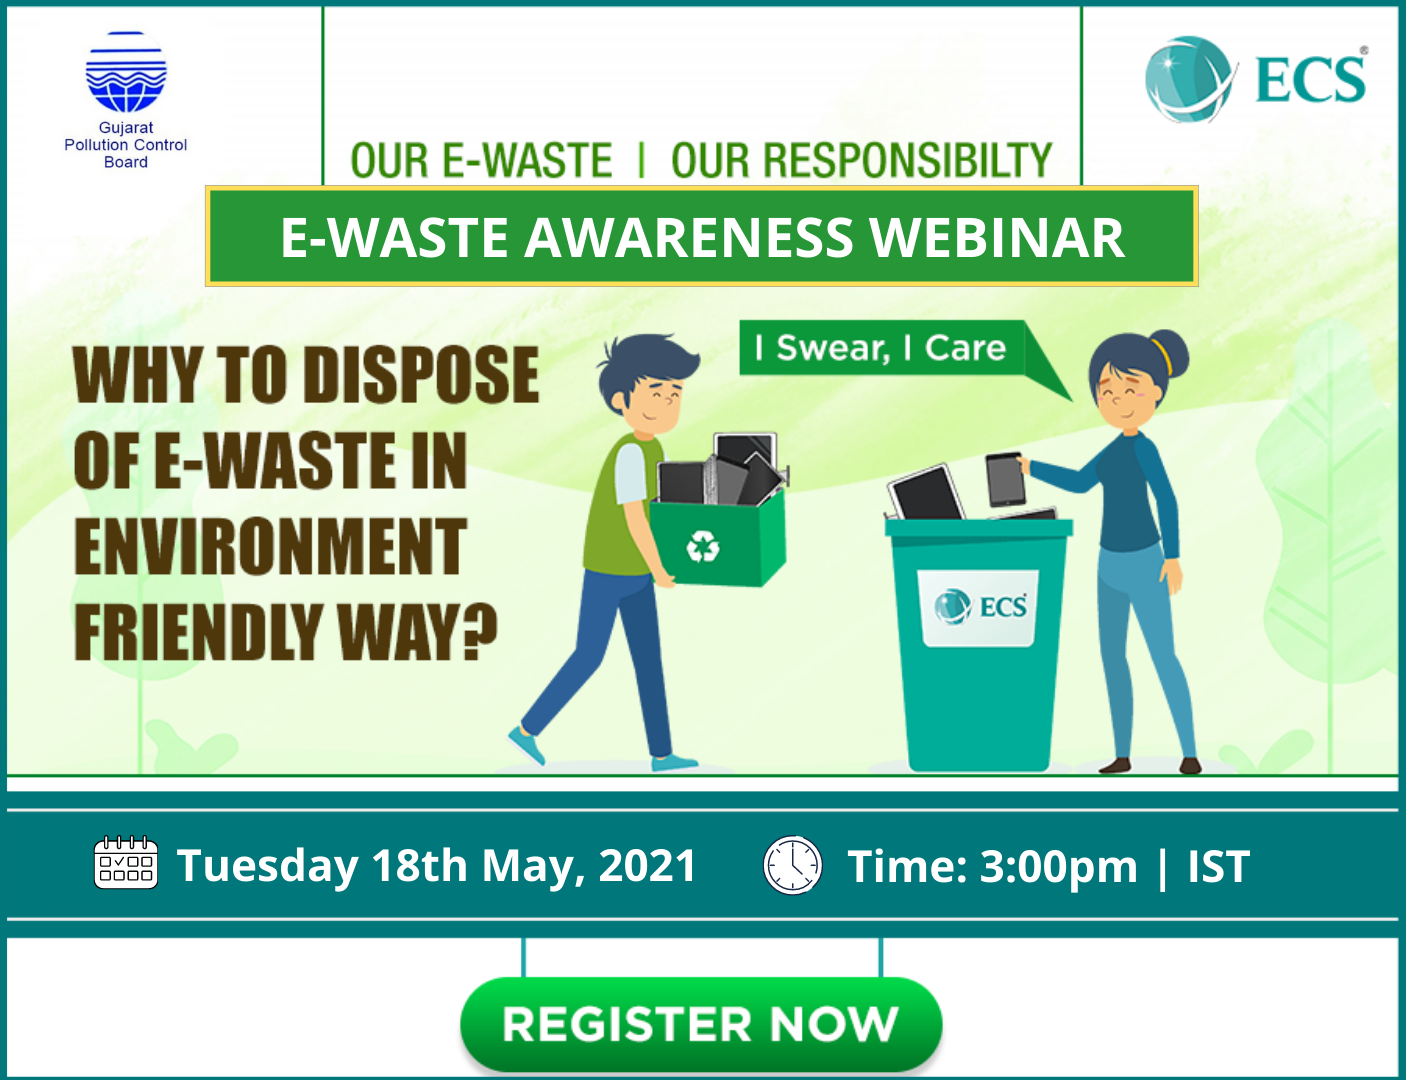 e-waste awareness webinar